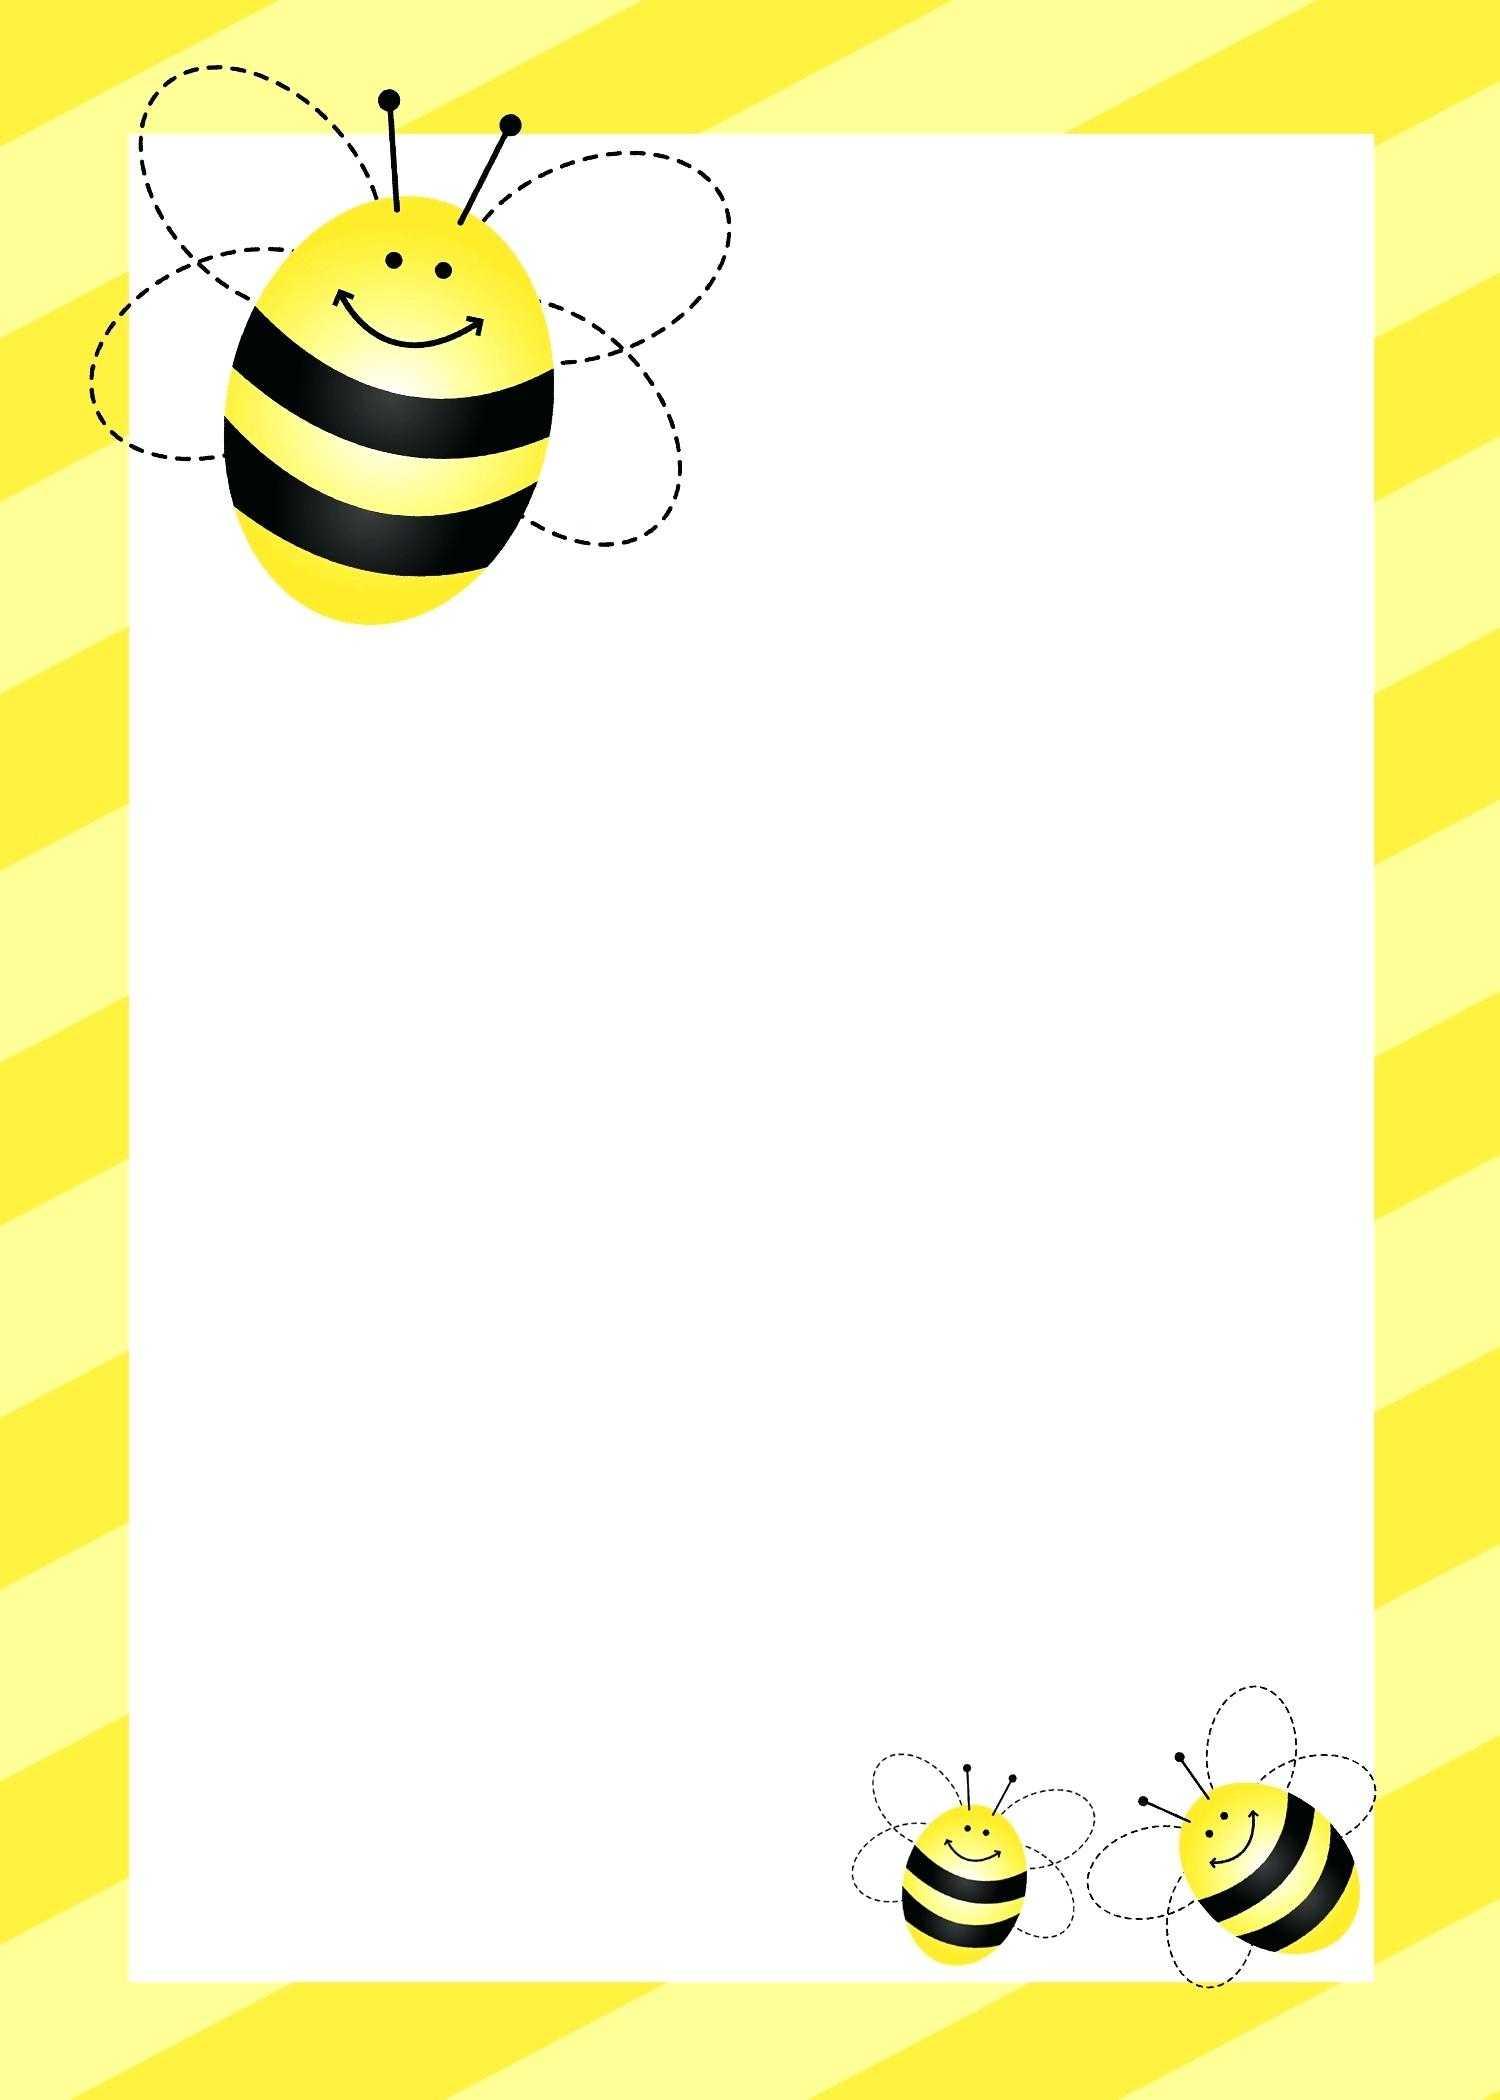 Certificate Clipart Spelling Bee, Certificate Spelling Bee Regarding Spelling Bee Award Certificate Template